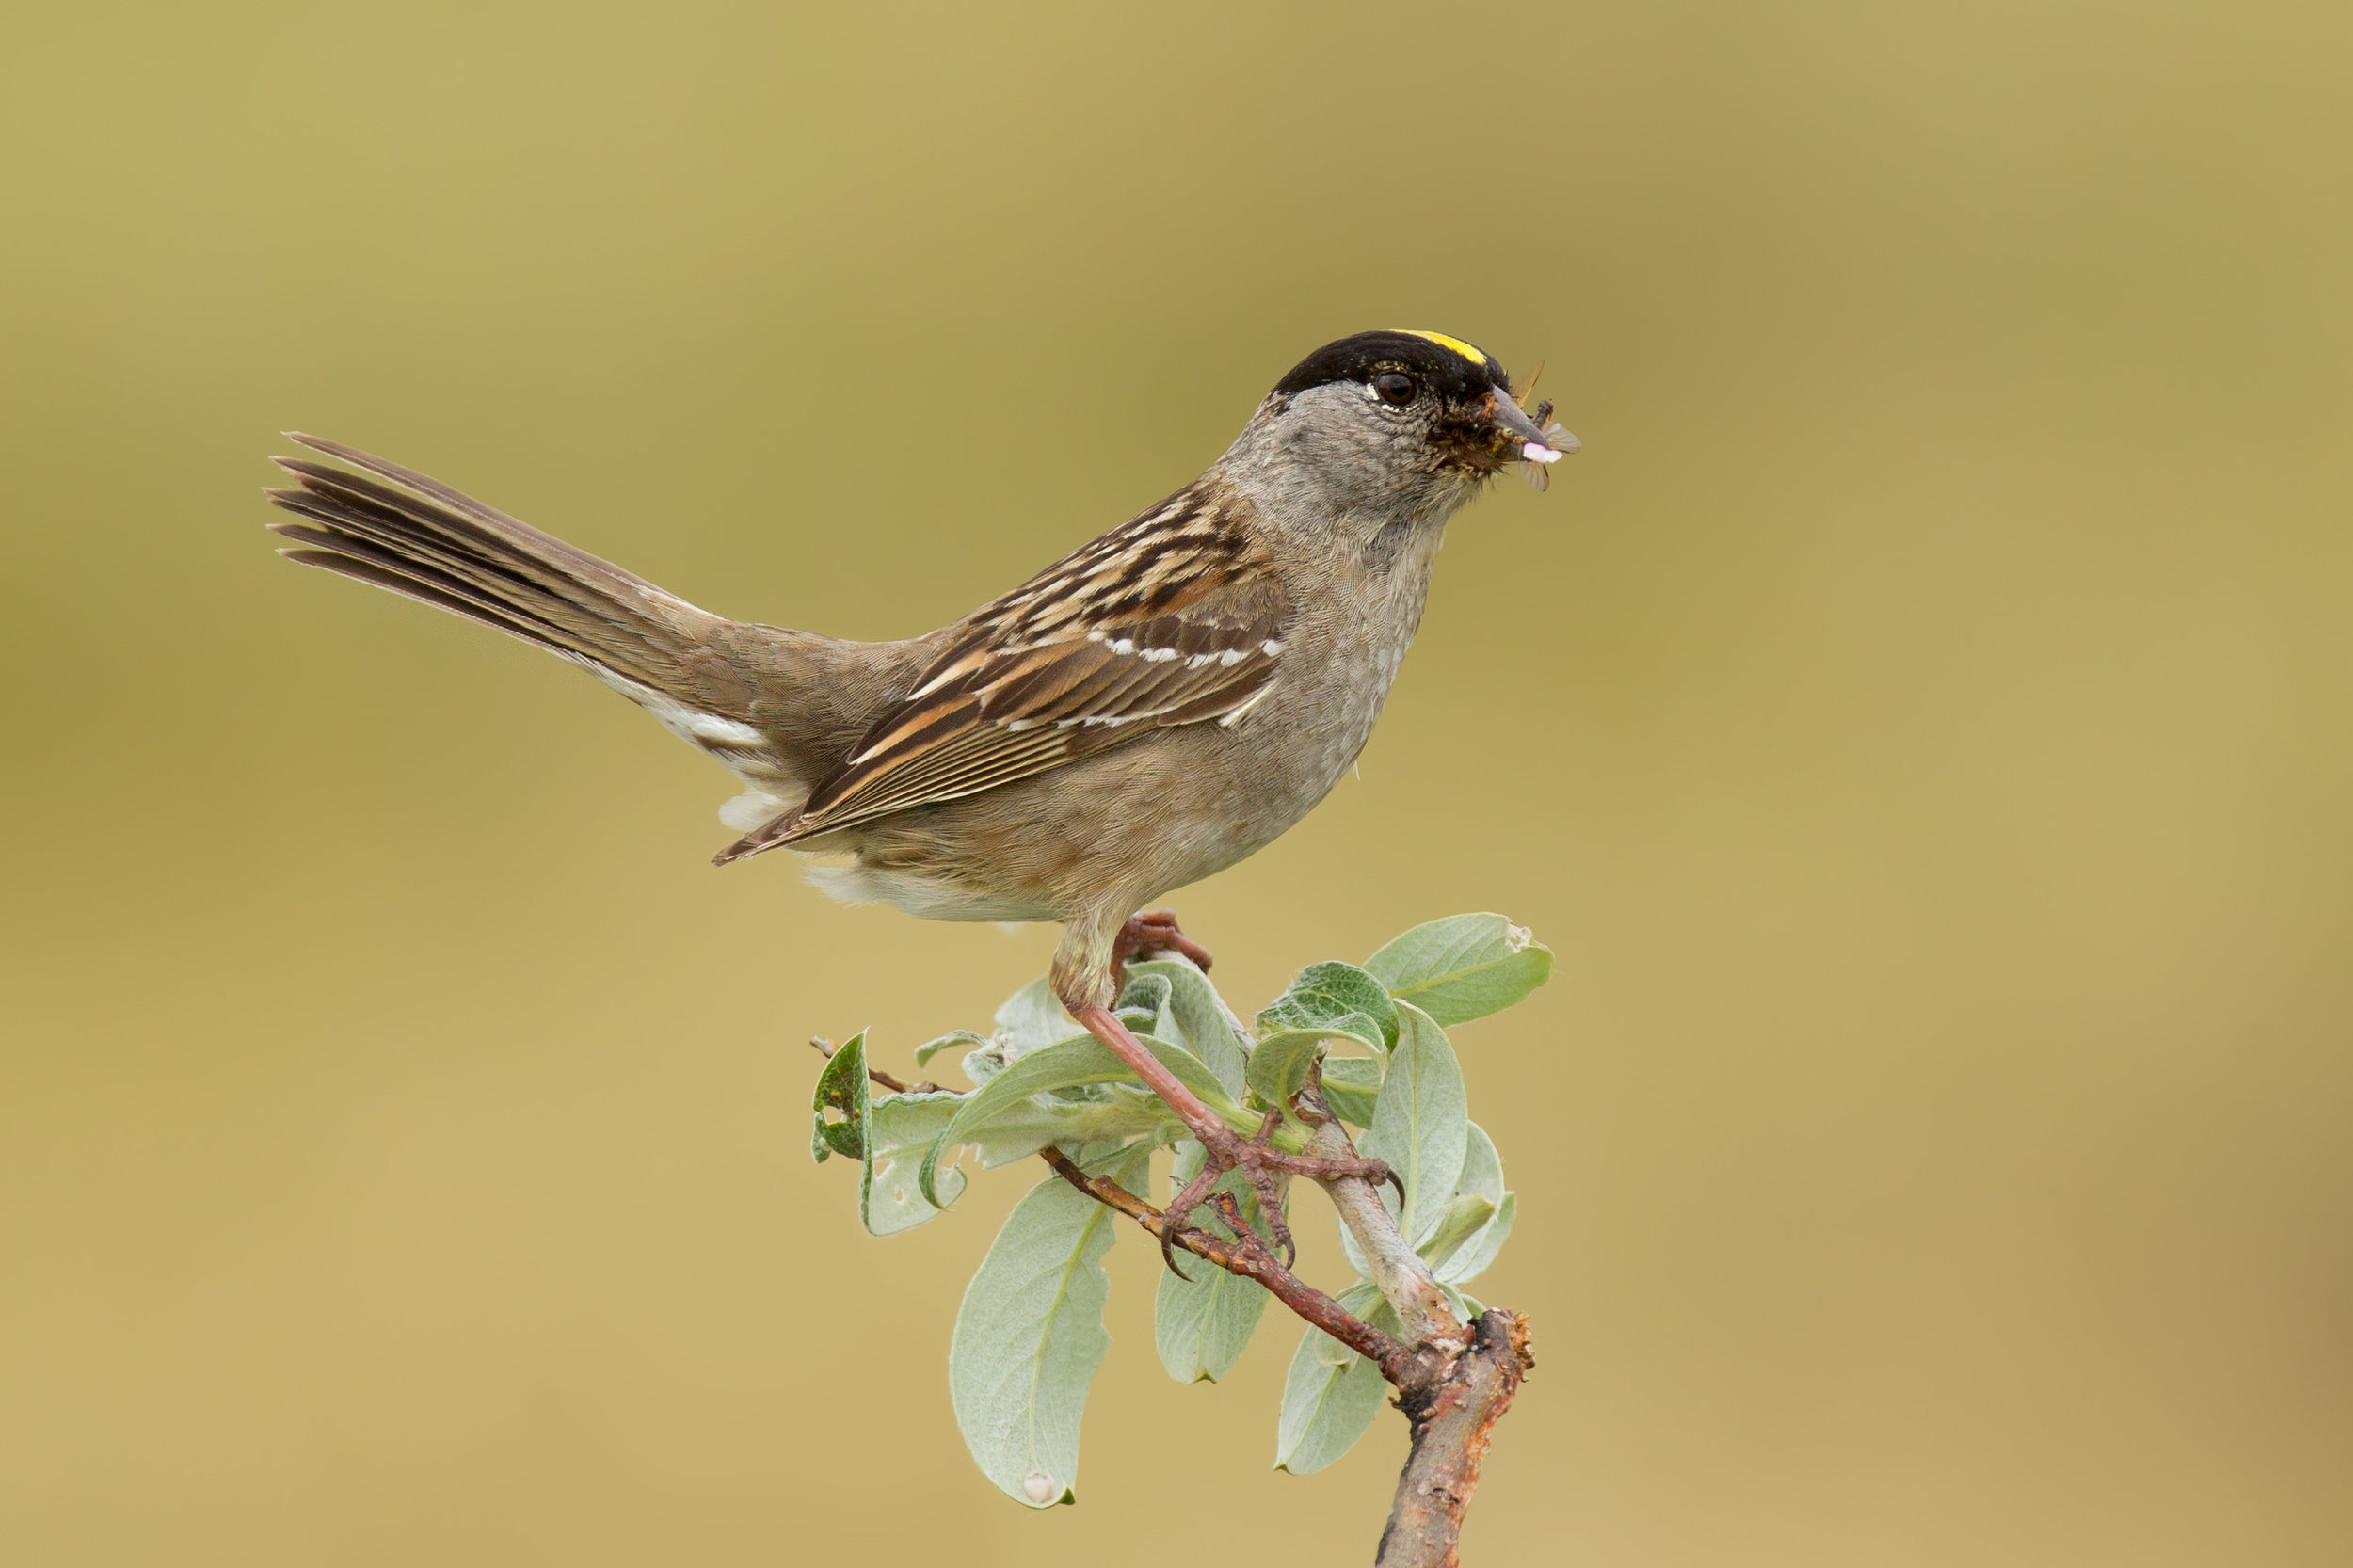 golden-crowned_sparrow_EI8C0328530b.jpg